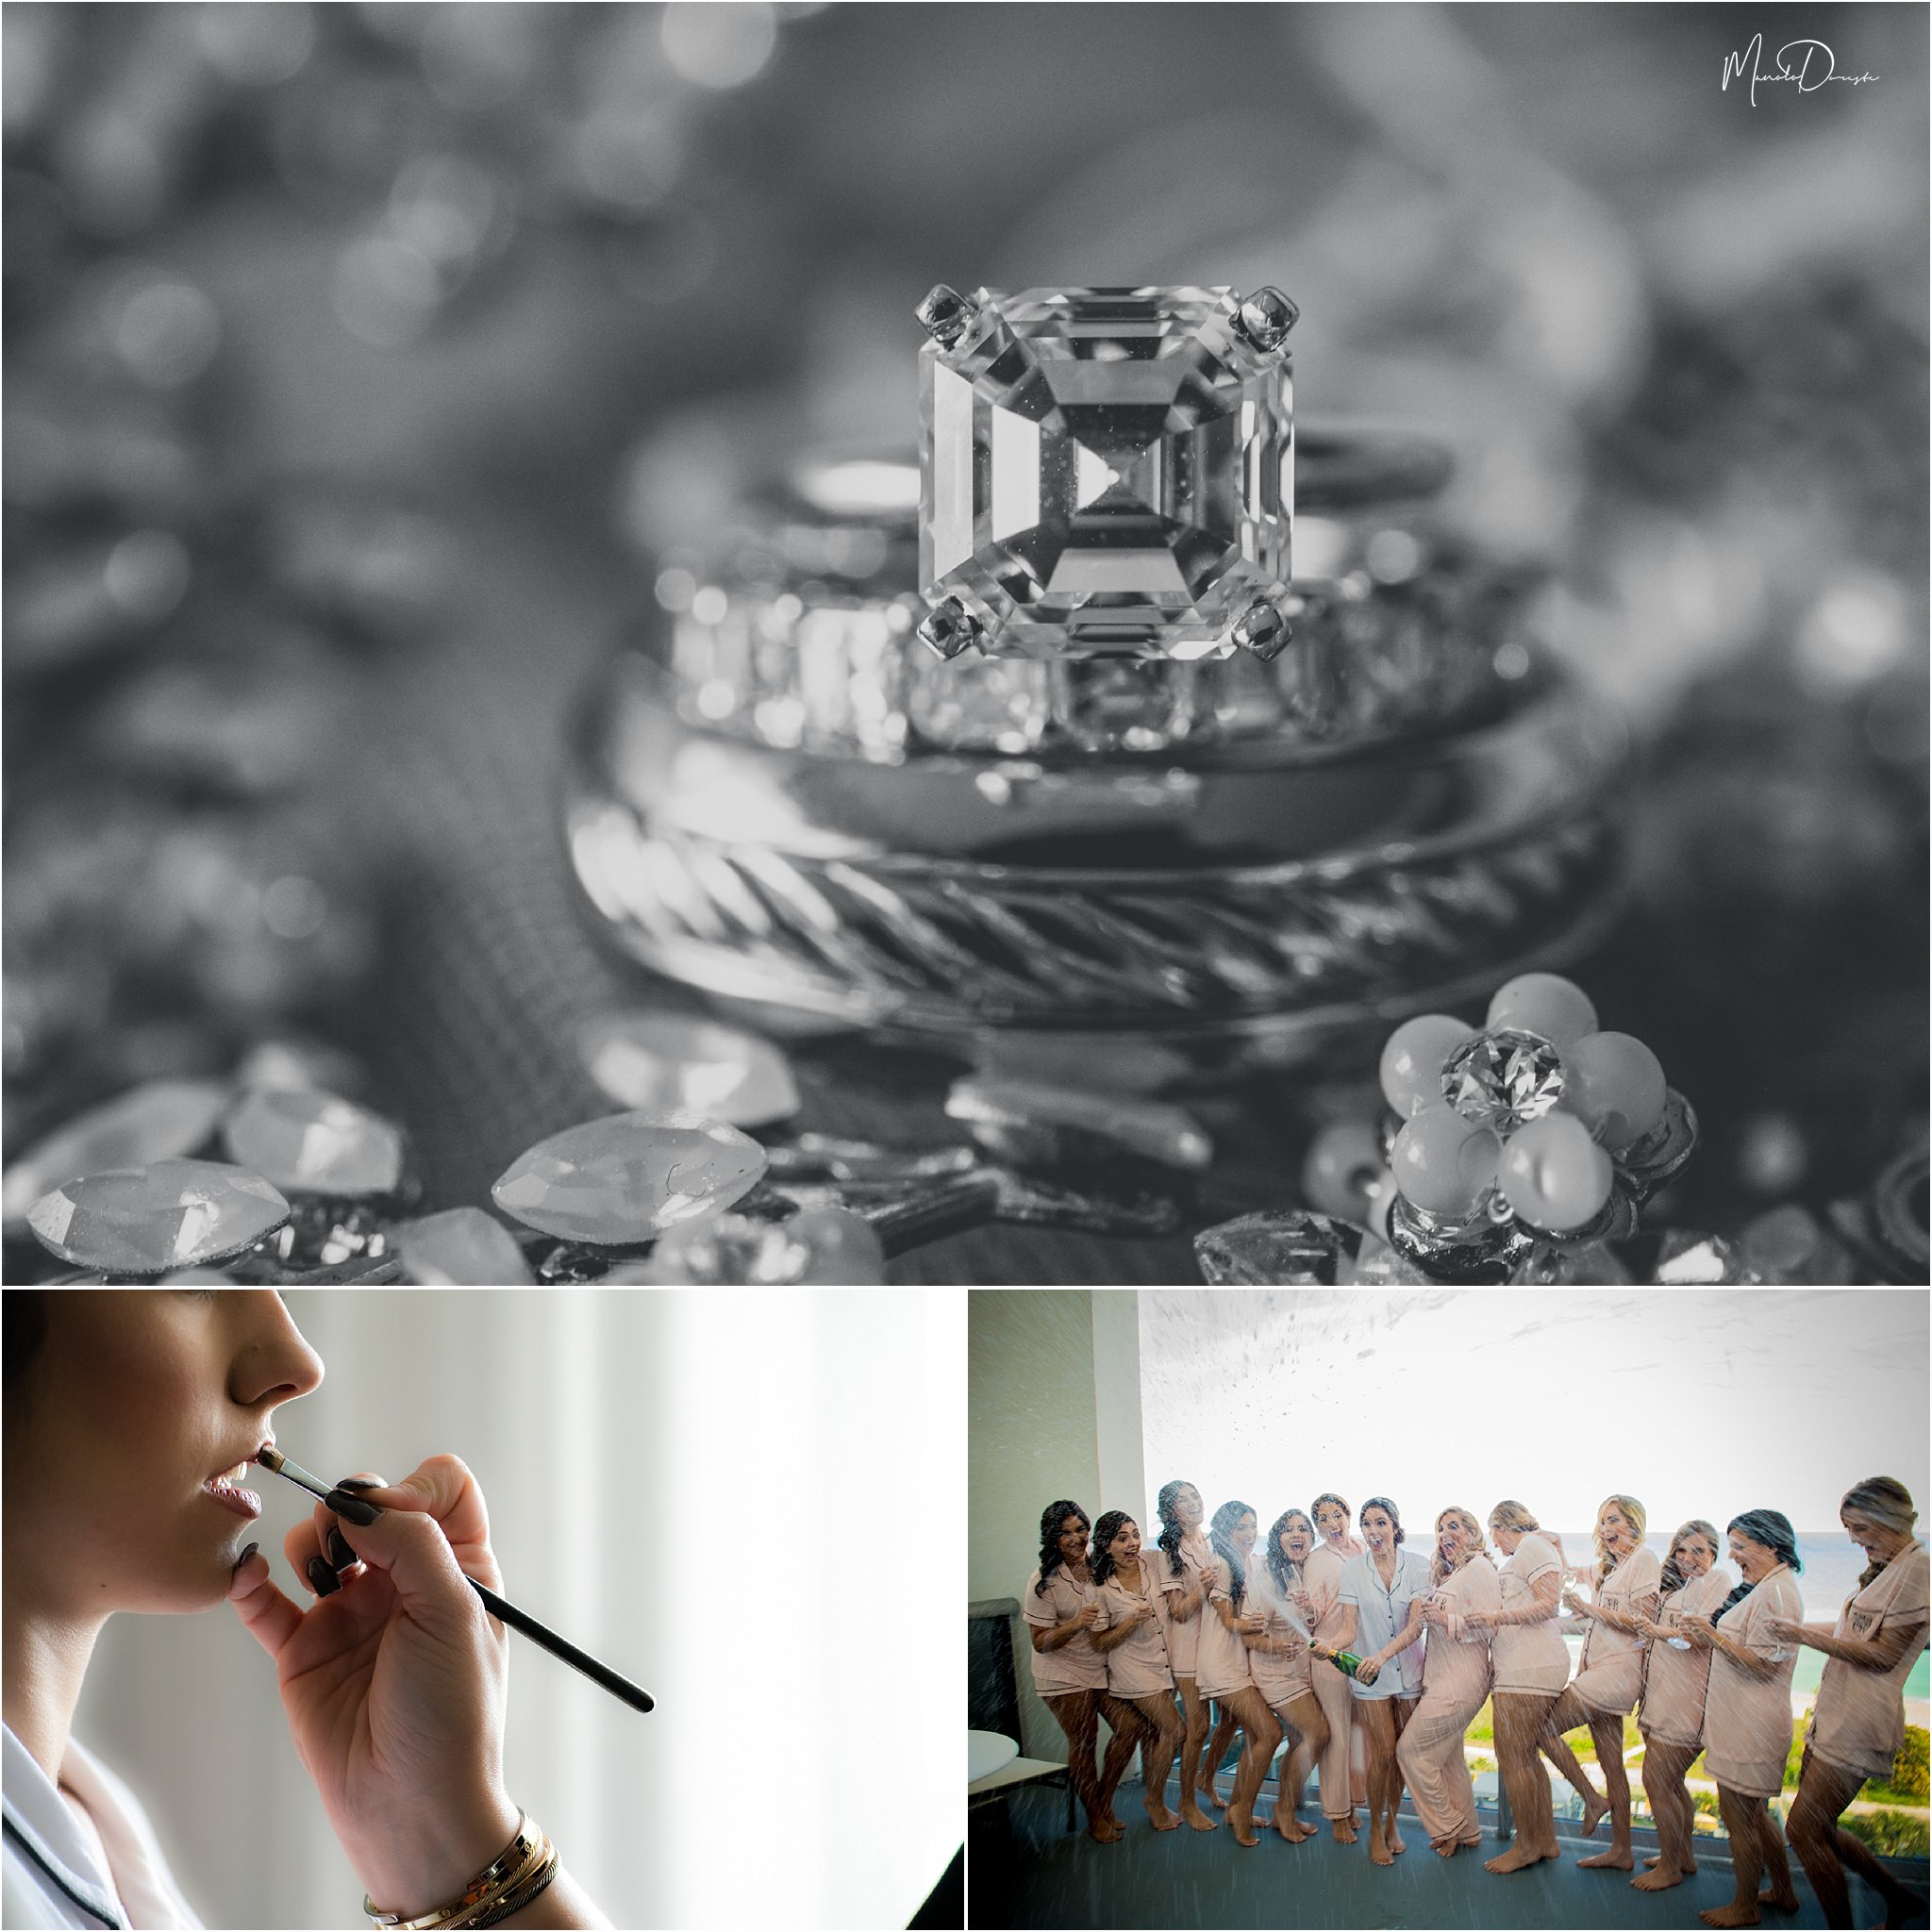 00926_ManoloDoreste_InFocusStudios_Wedding_Family_Photography_Miami_MiamiPhotographer.jpg